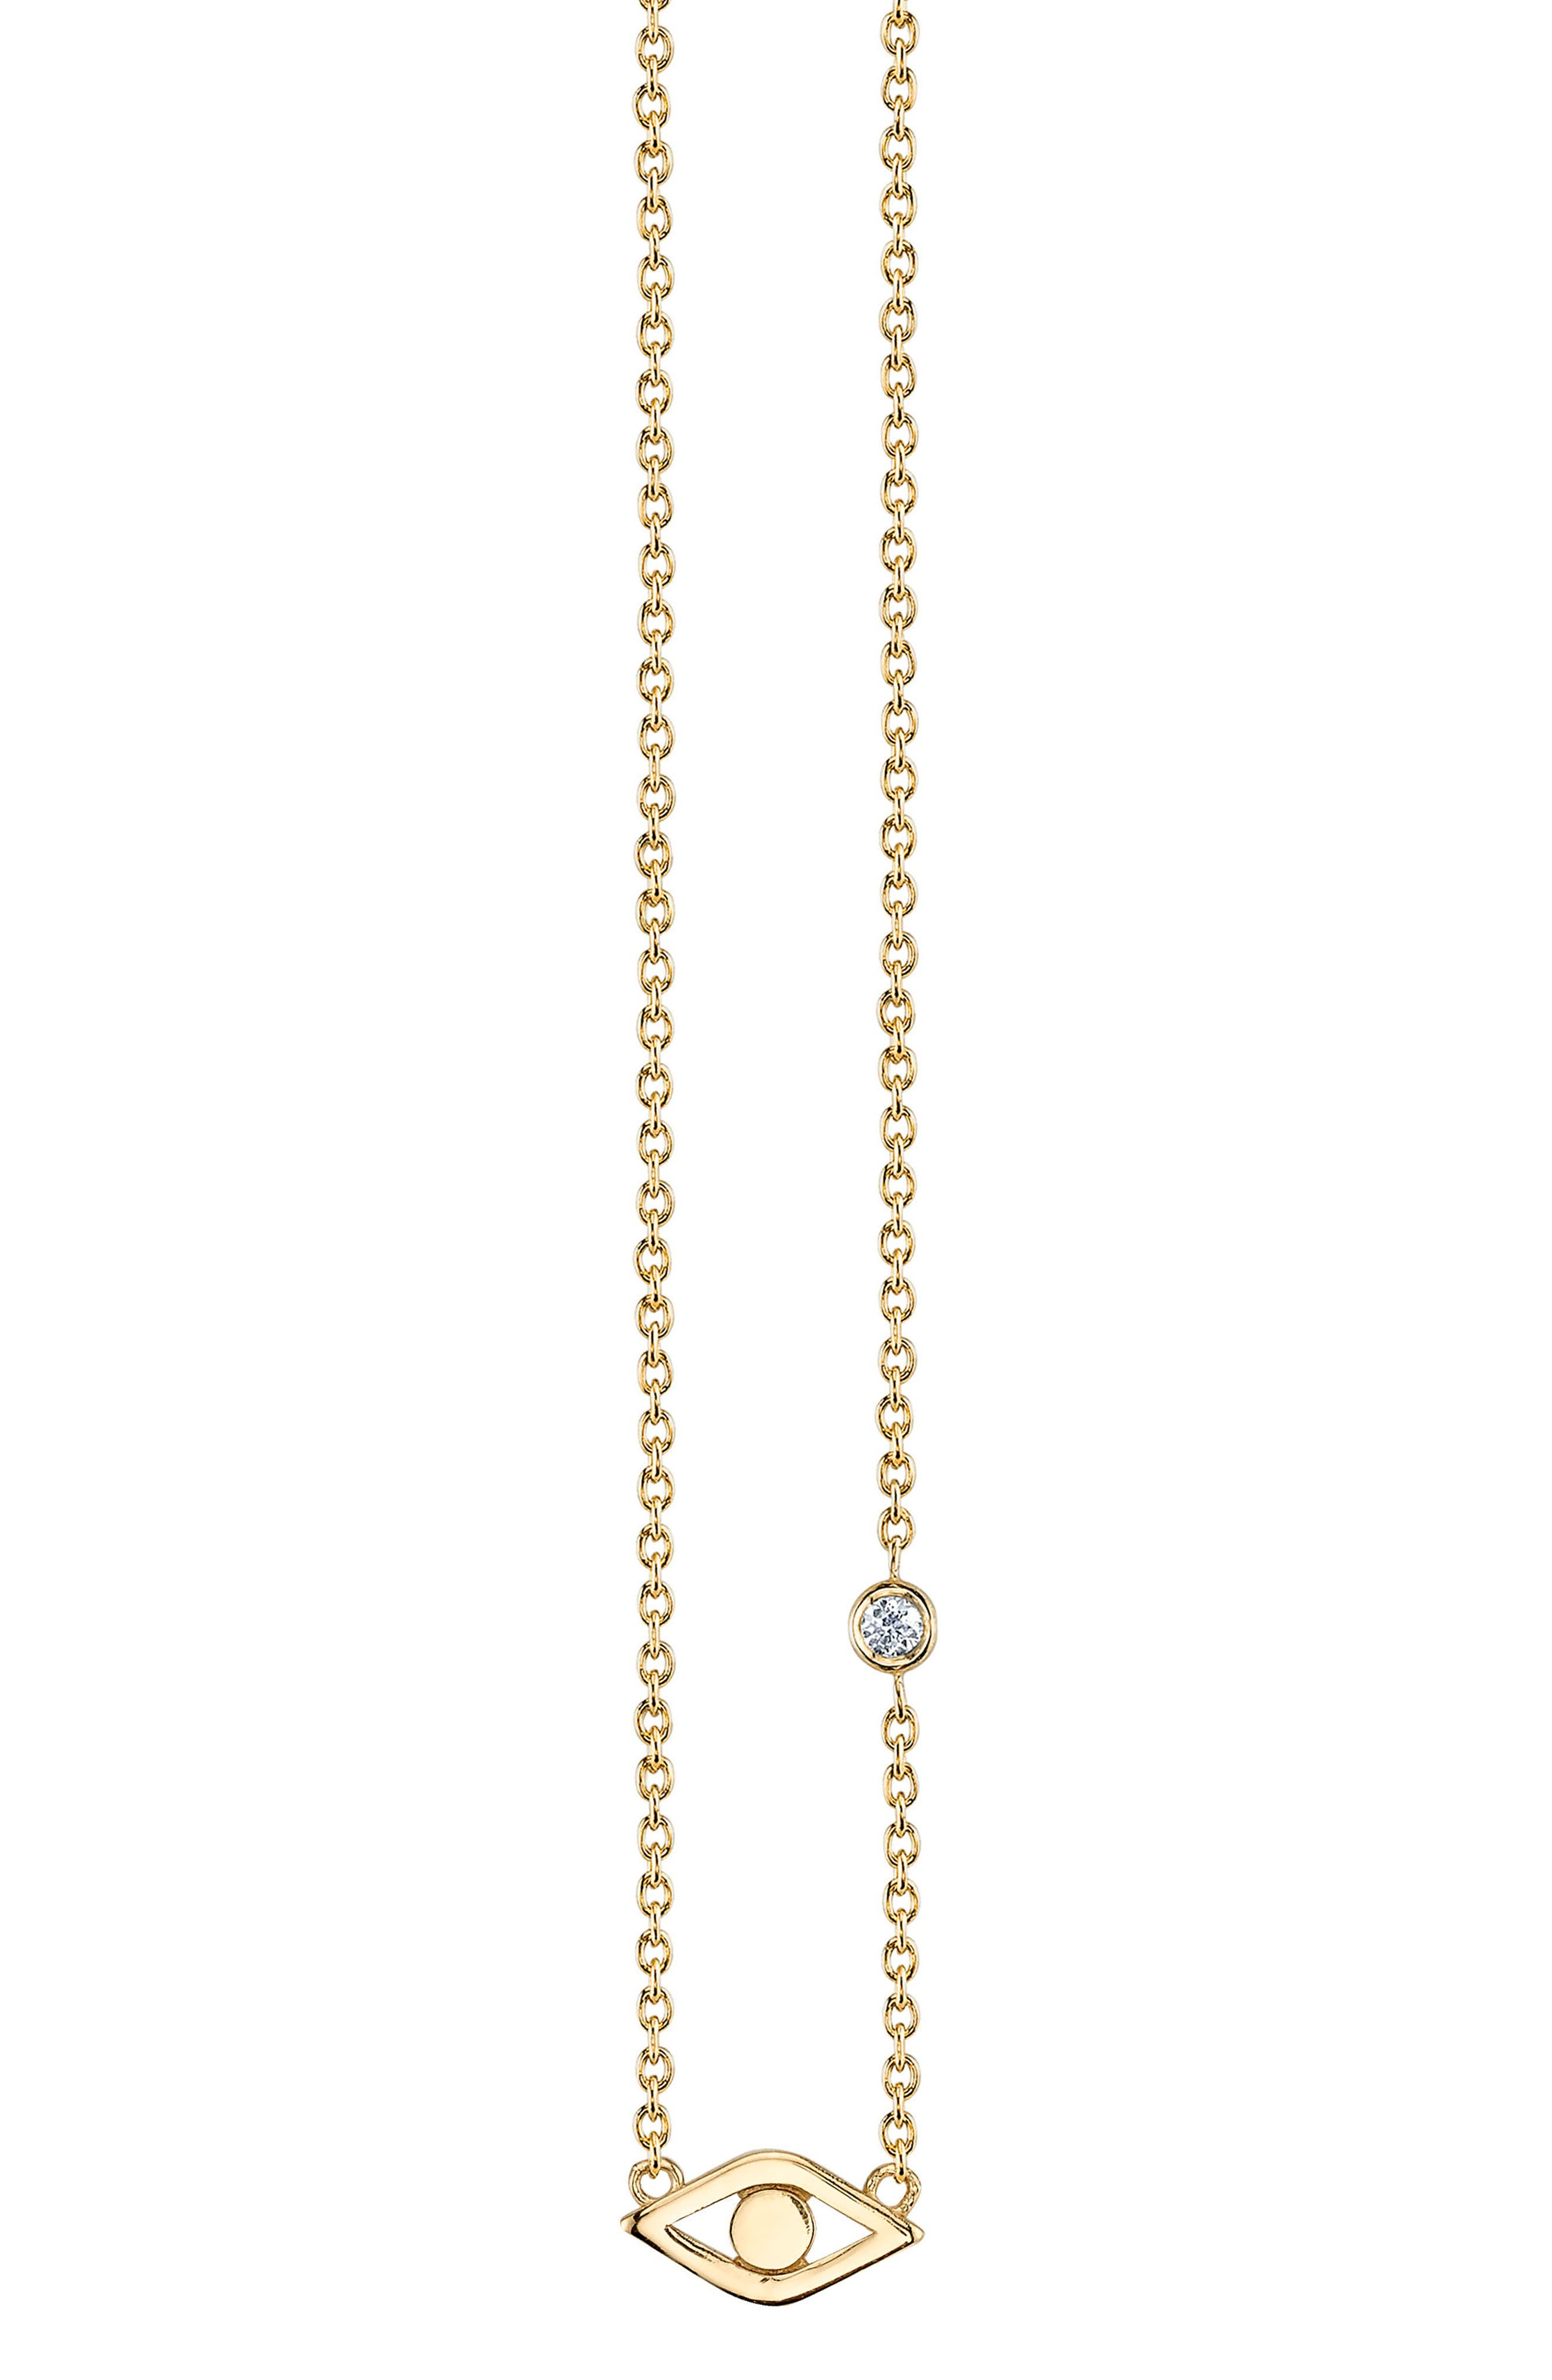 Evil Eye Pendant Necklace,                         Main,                         color, Gold